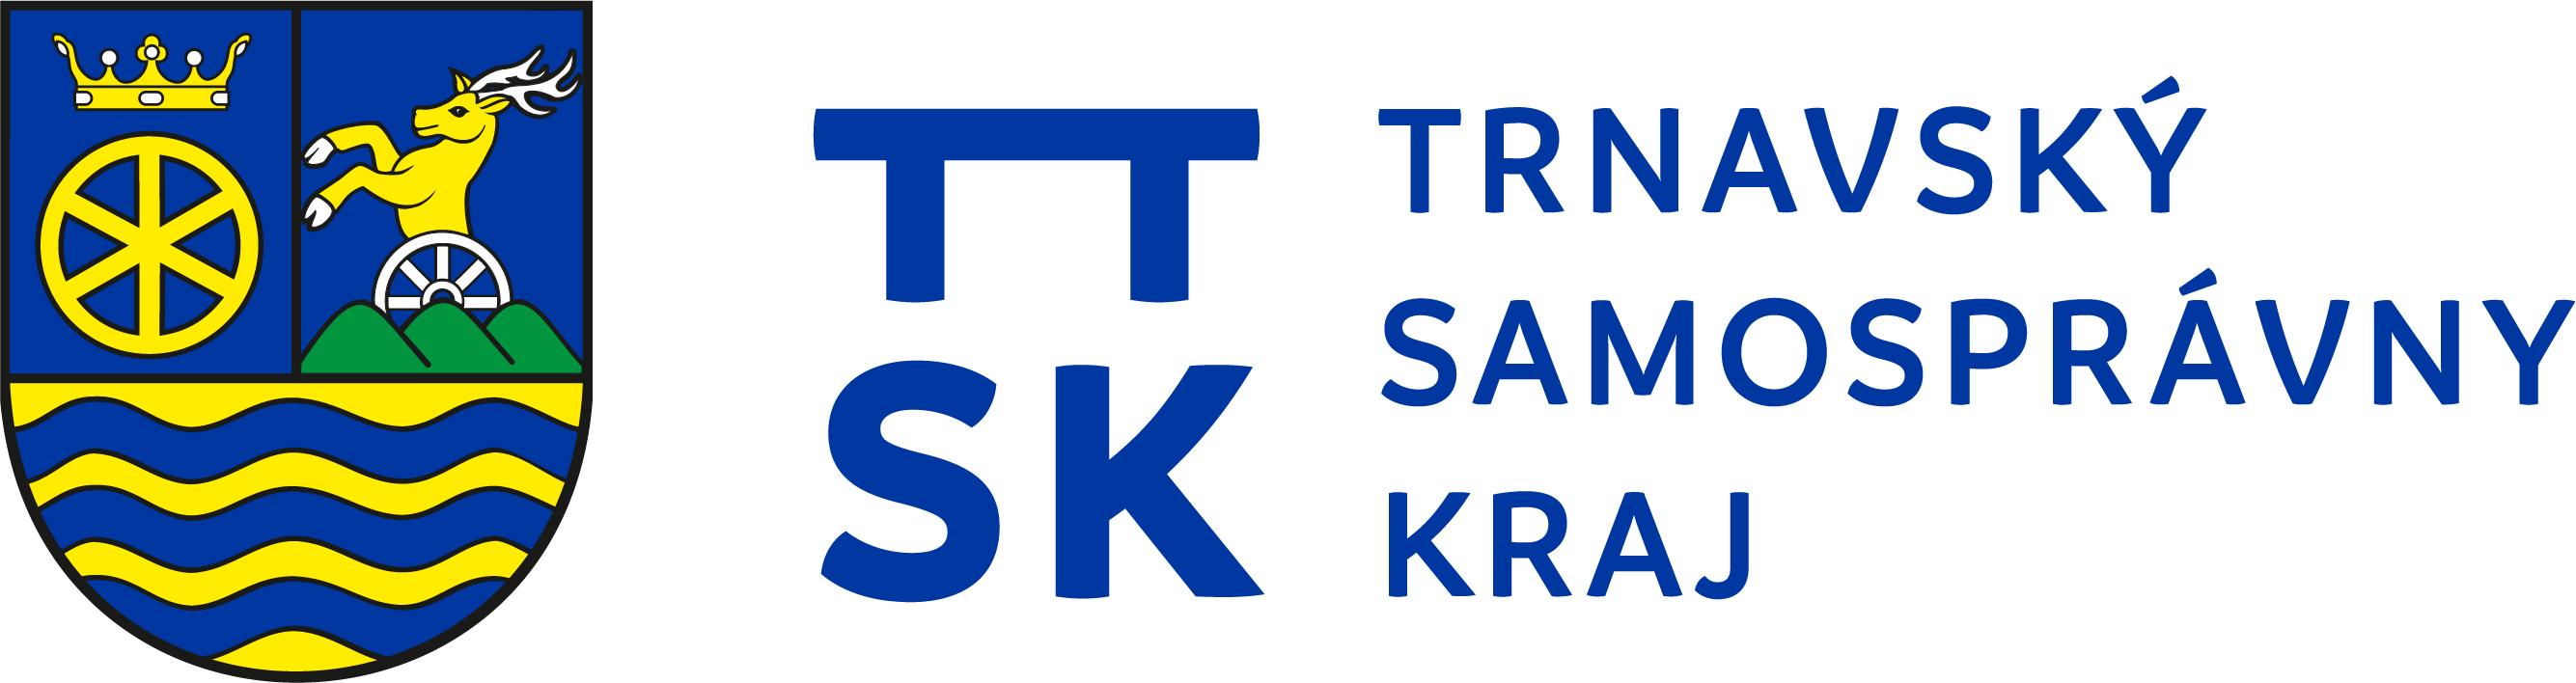 Logo - Trnavský samosprávny kraj